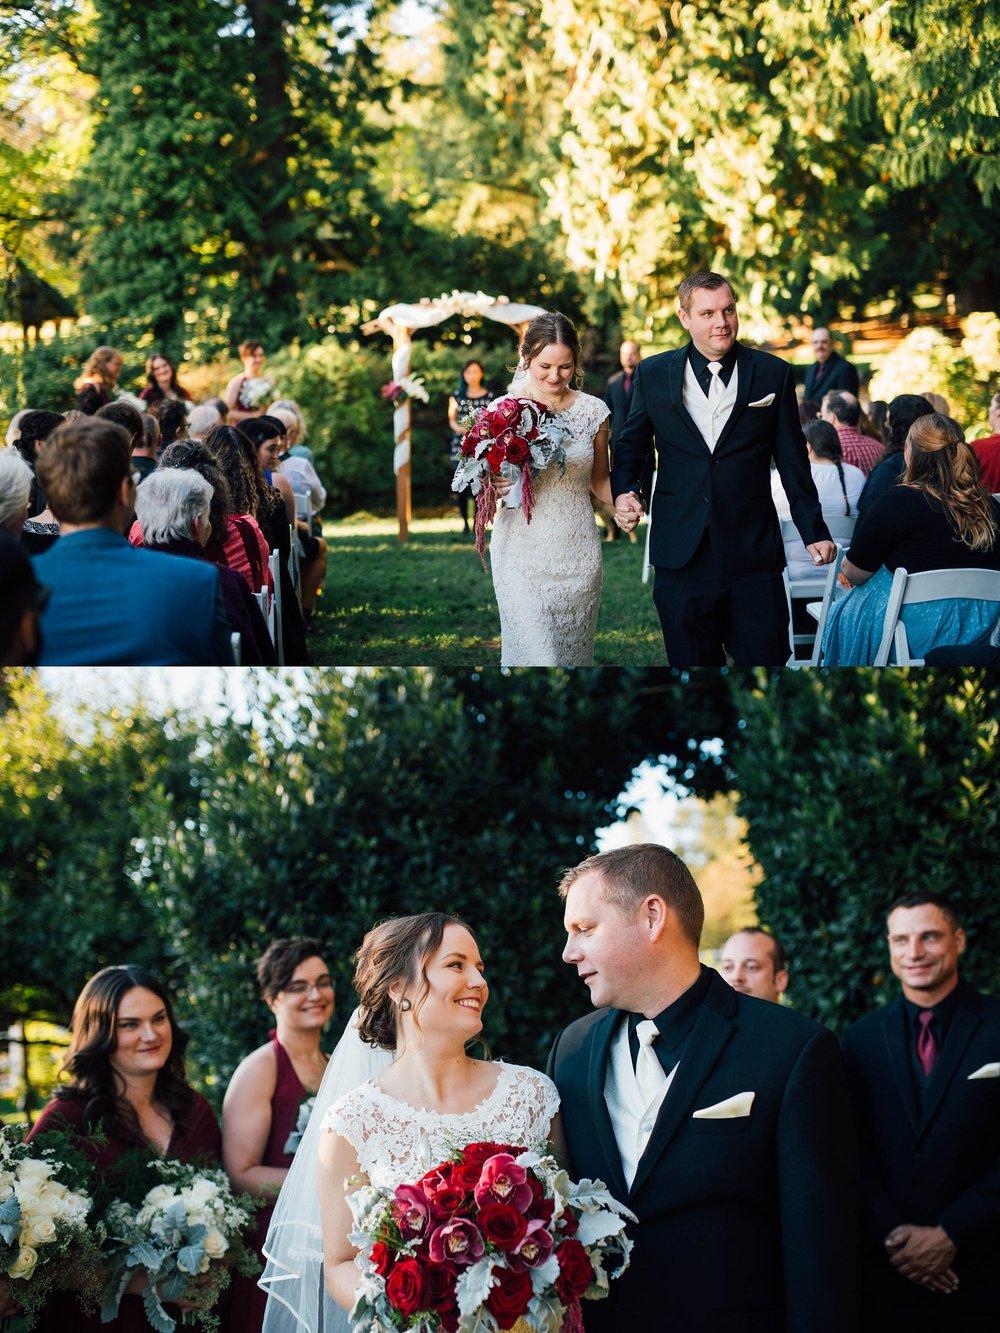 ashley_vos_seattle_ wedding_photographer_0193.jpg